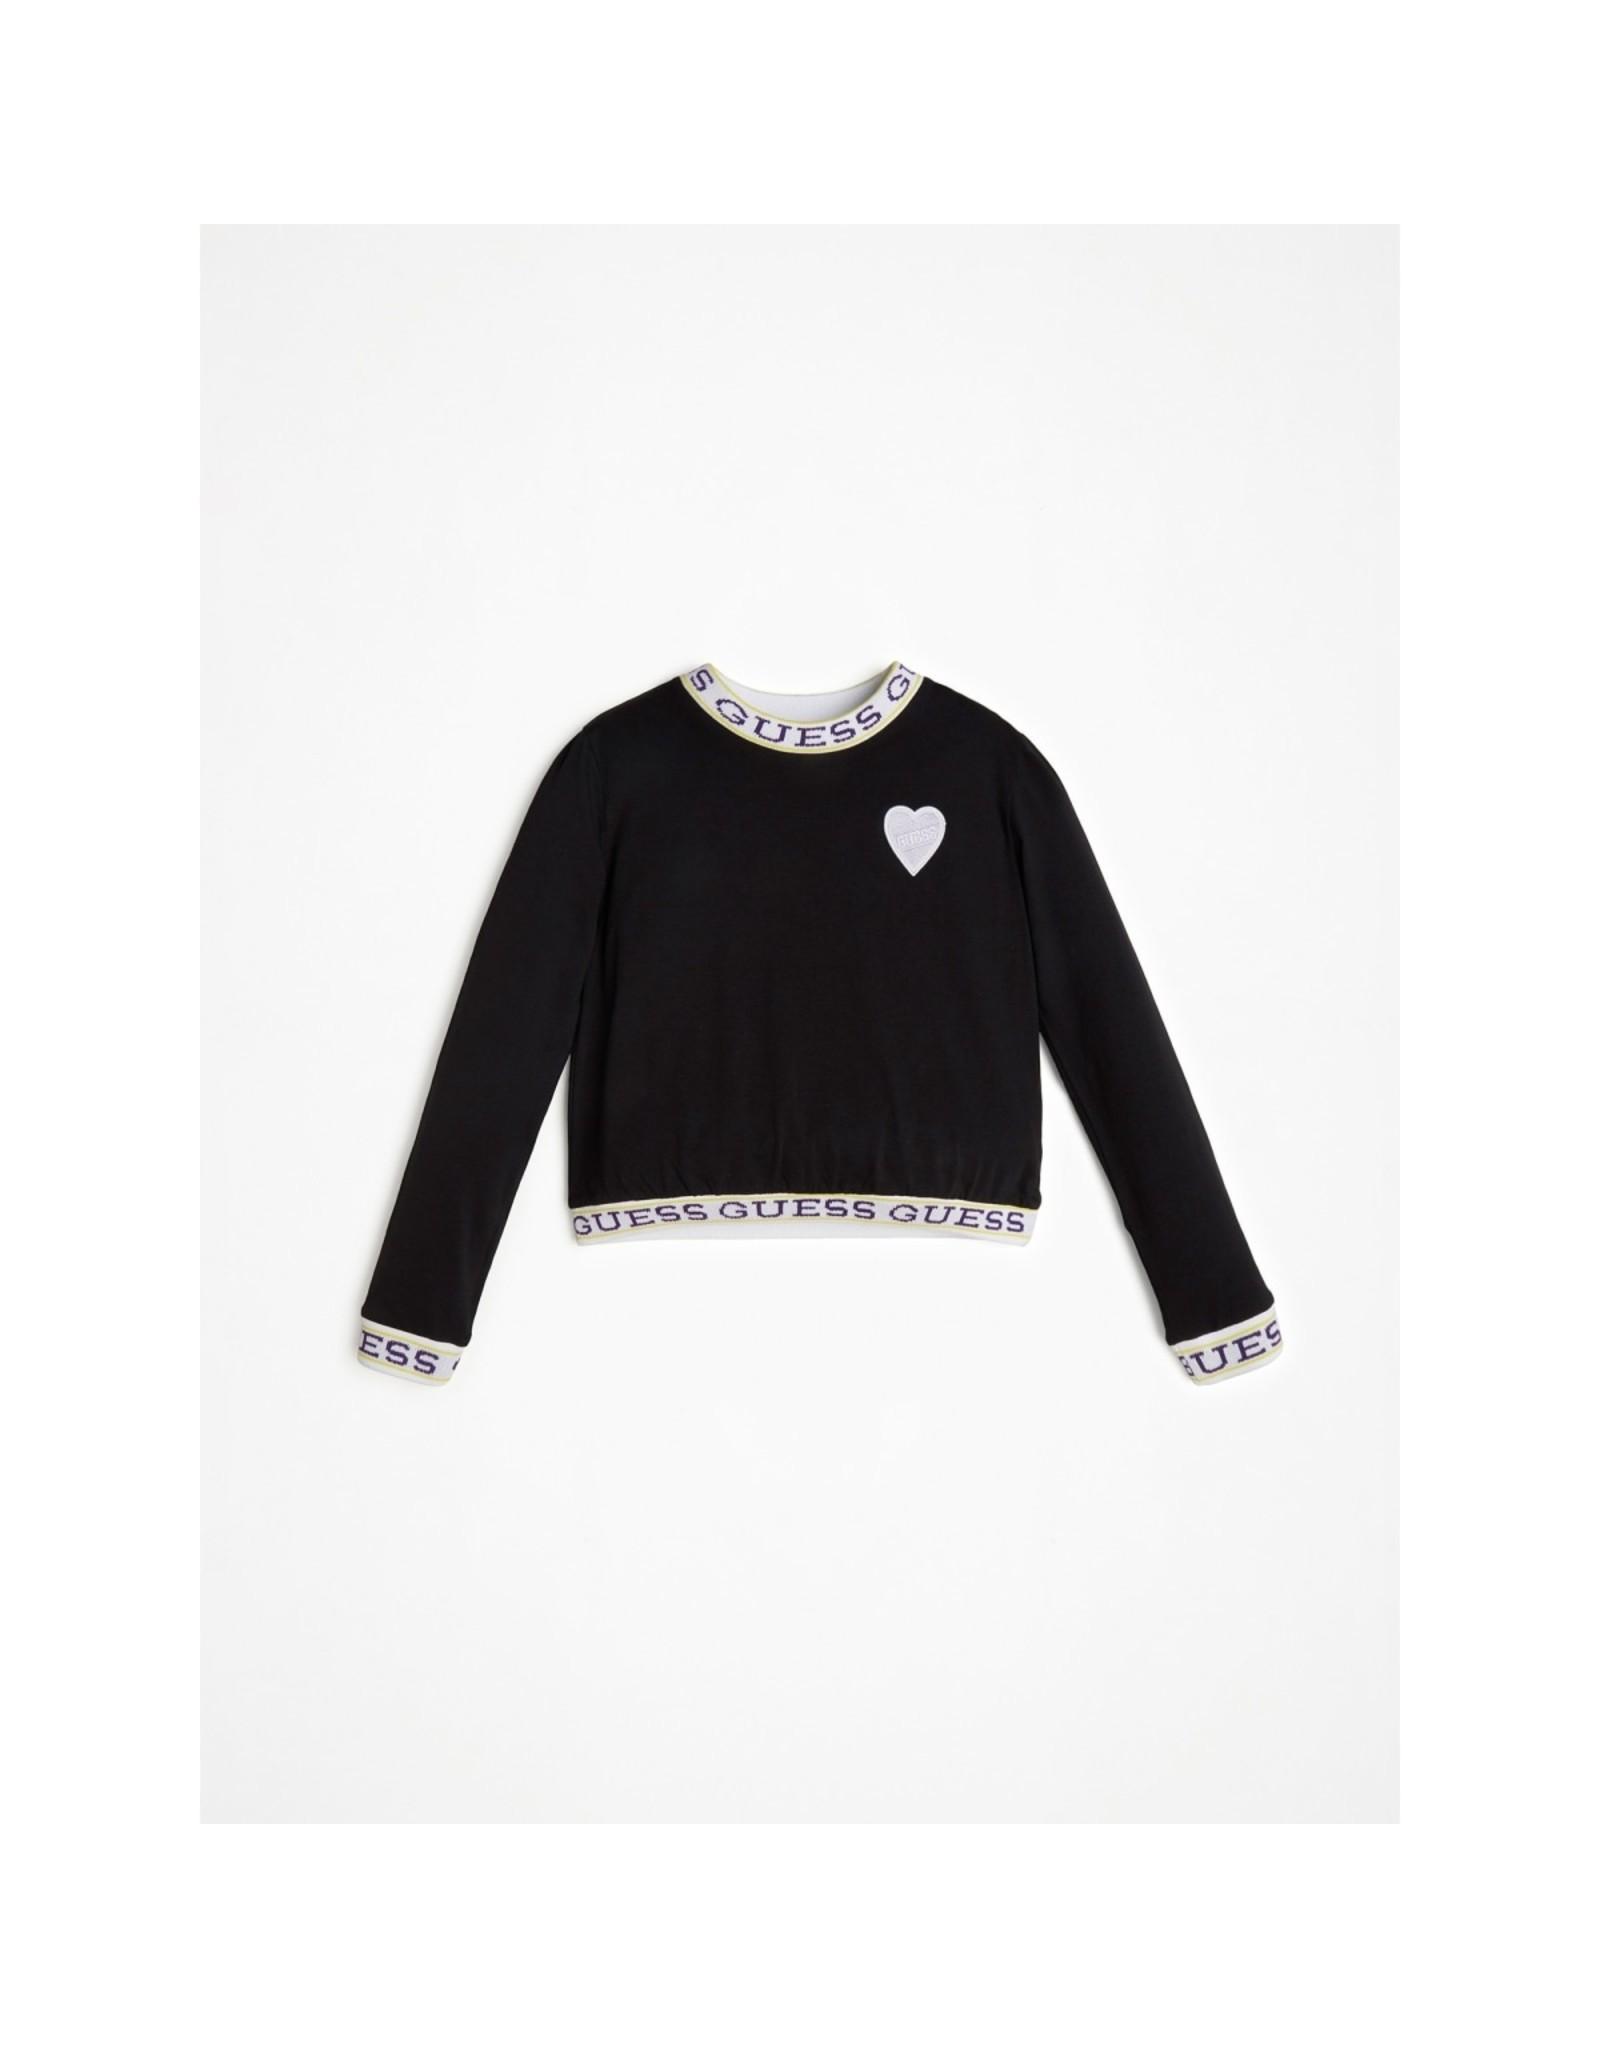 Guess Sweater Logo Tape Neon Black